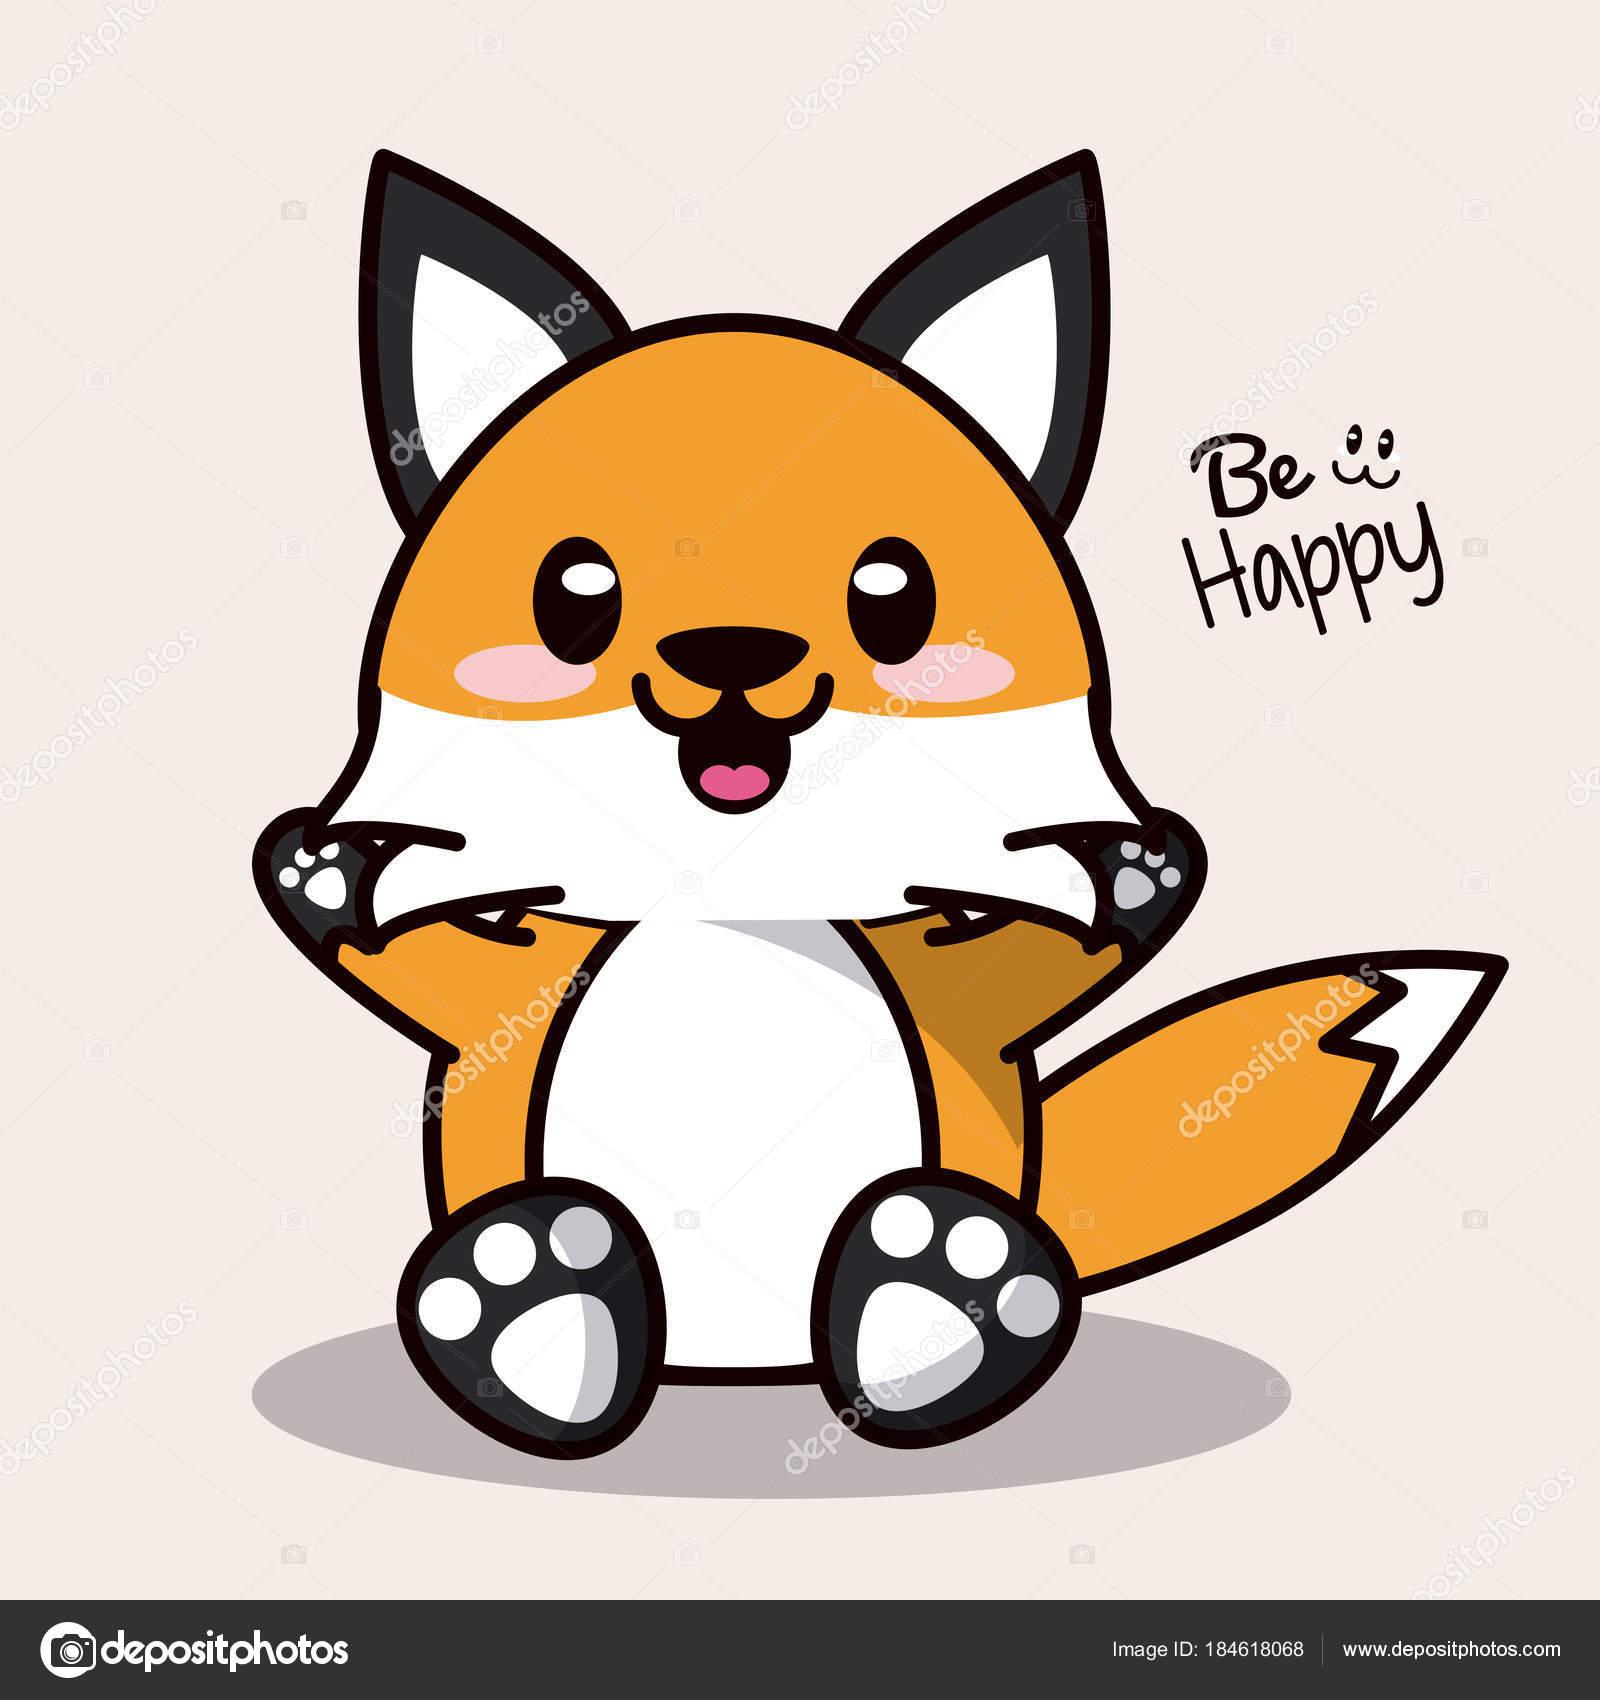 Couleur De Fond Avec Kawaii Cute Animal Renard Bonheur D Expression